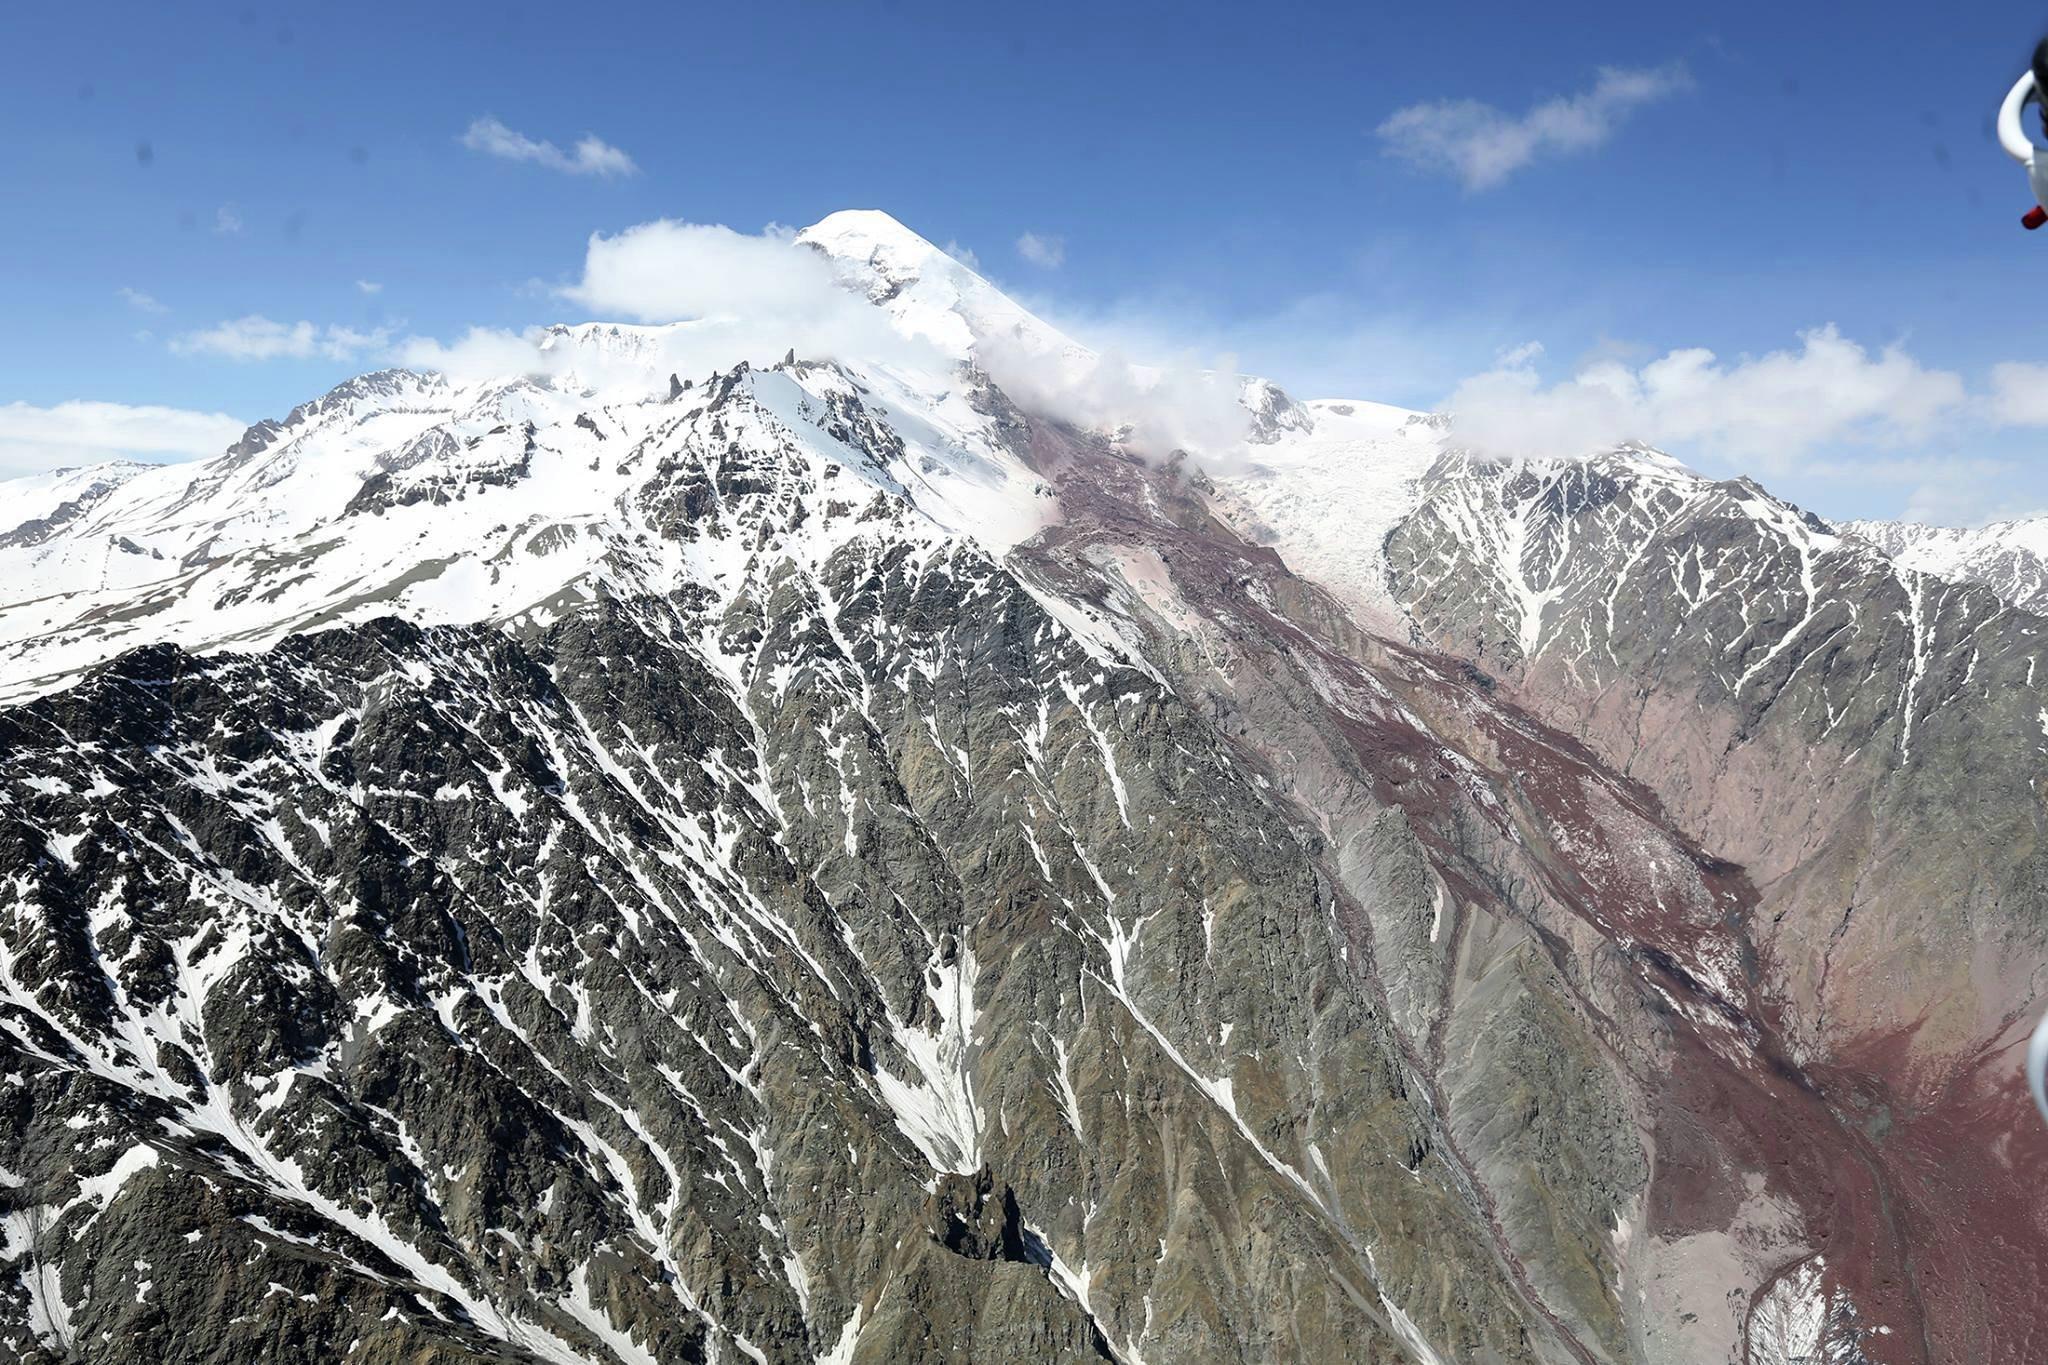 горы, Казбек, Кавказ, Дарьяльское ущелье